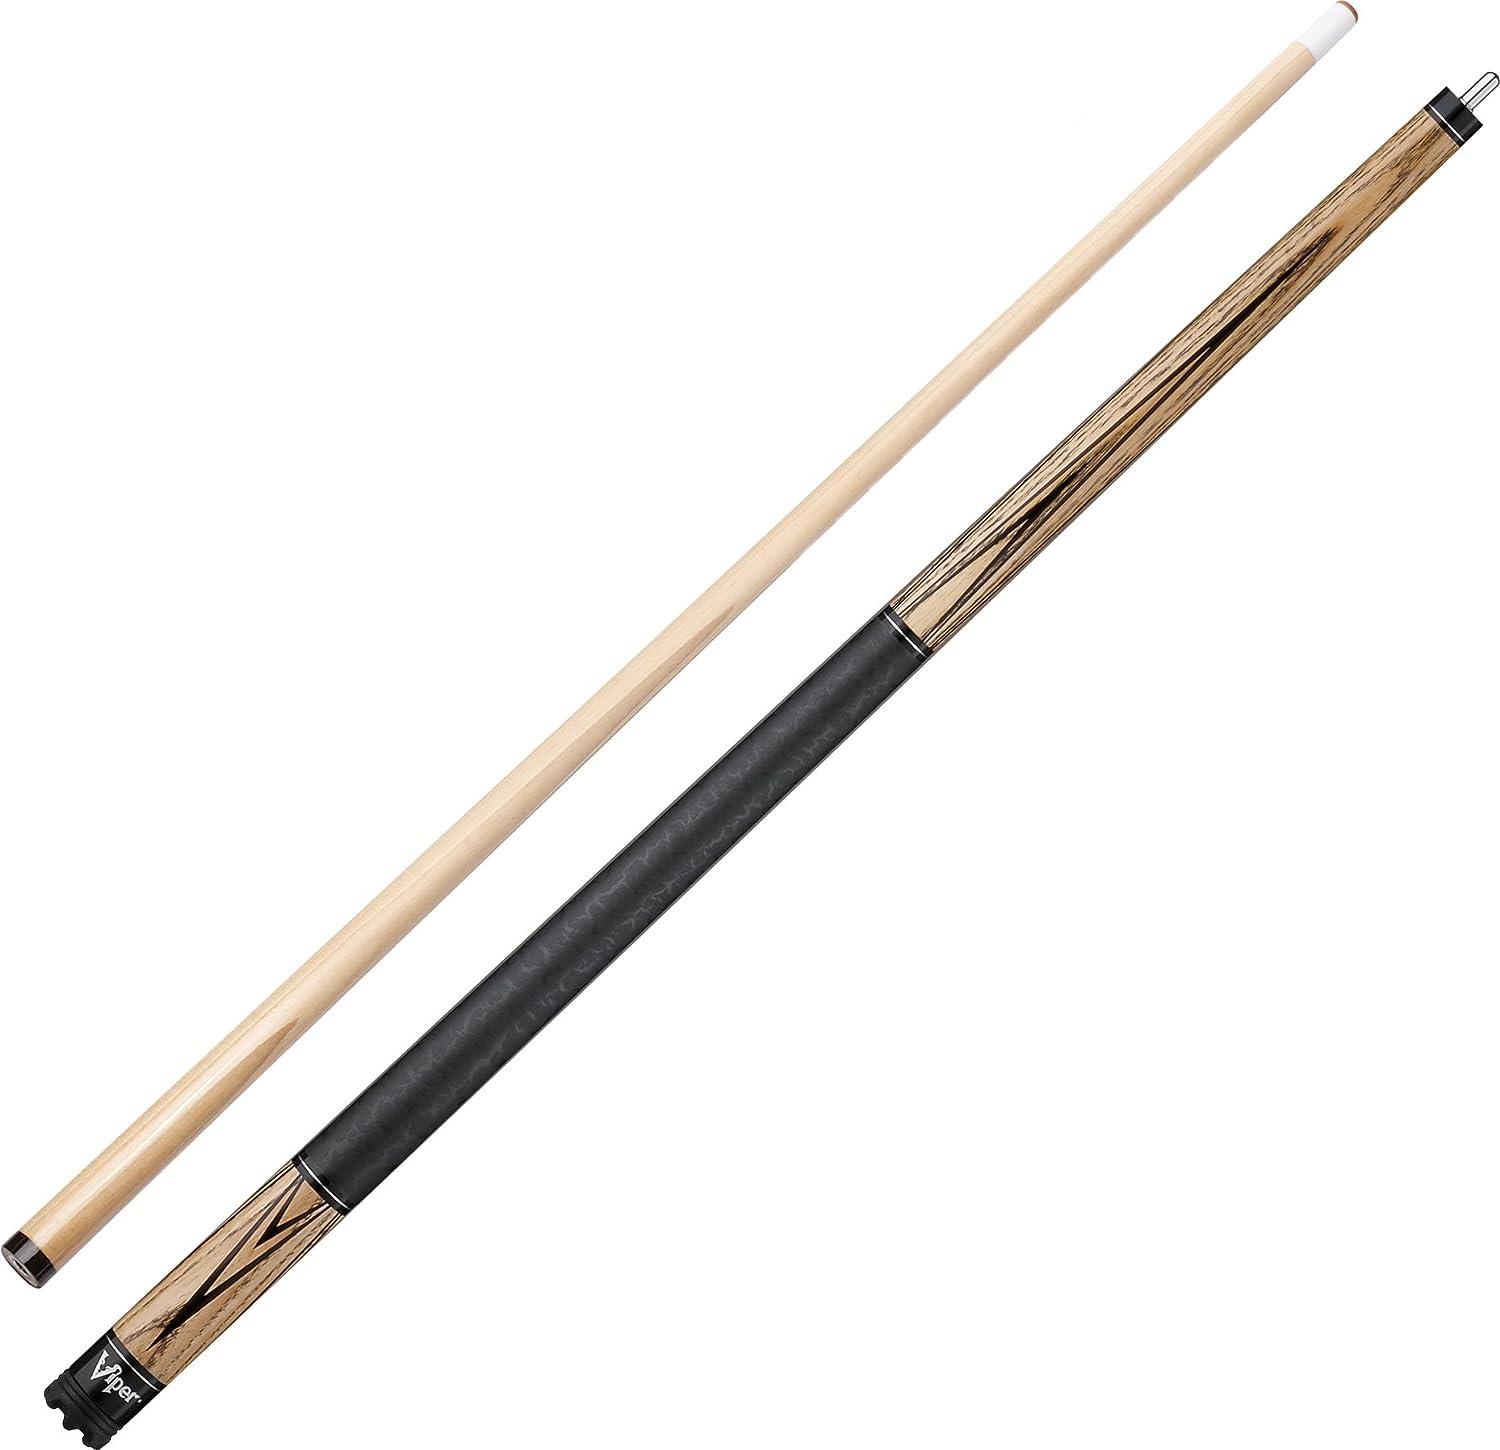 Viper Elemental 58  2-Piece Billiard Pool Cue, Natural Ash with Wood Grain, 21 Ounce